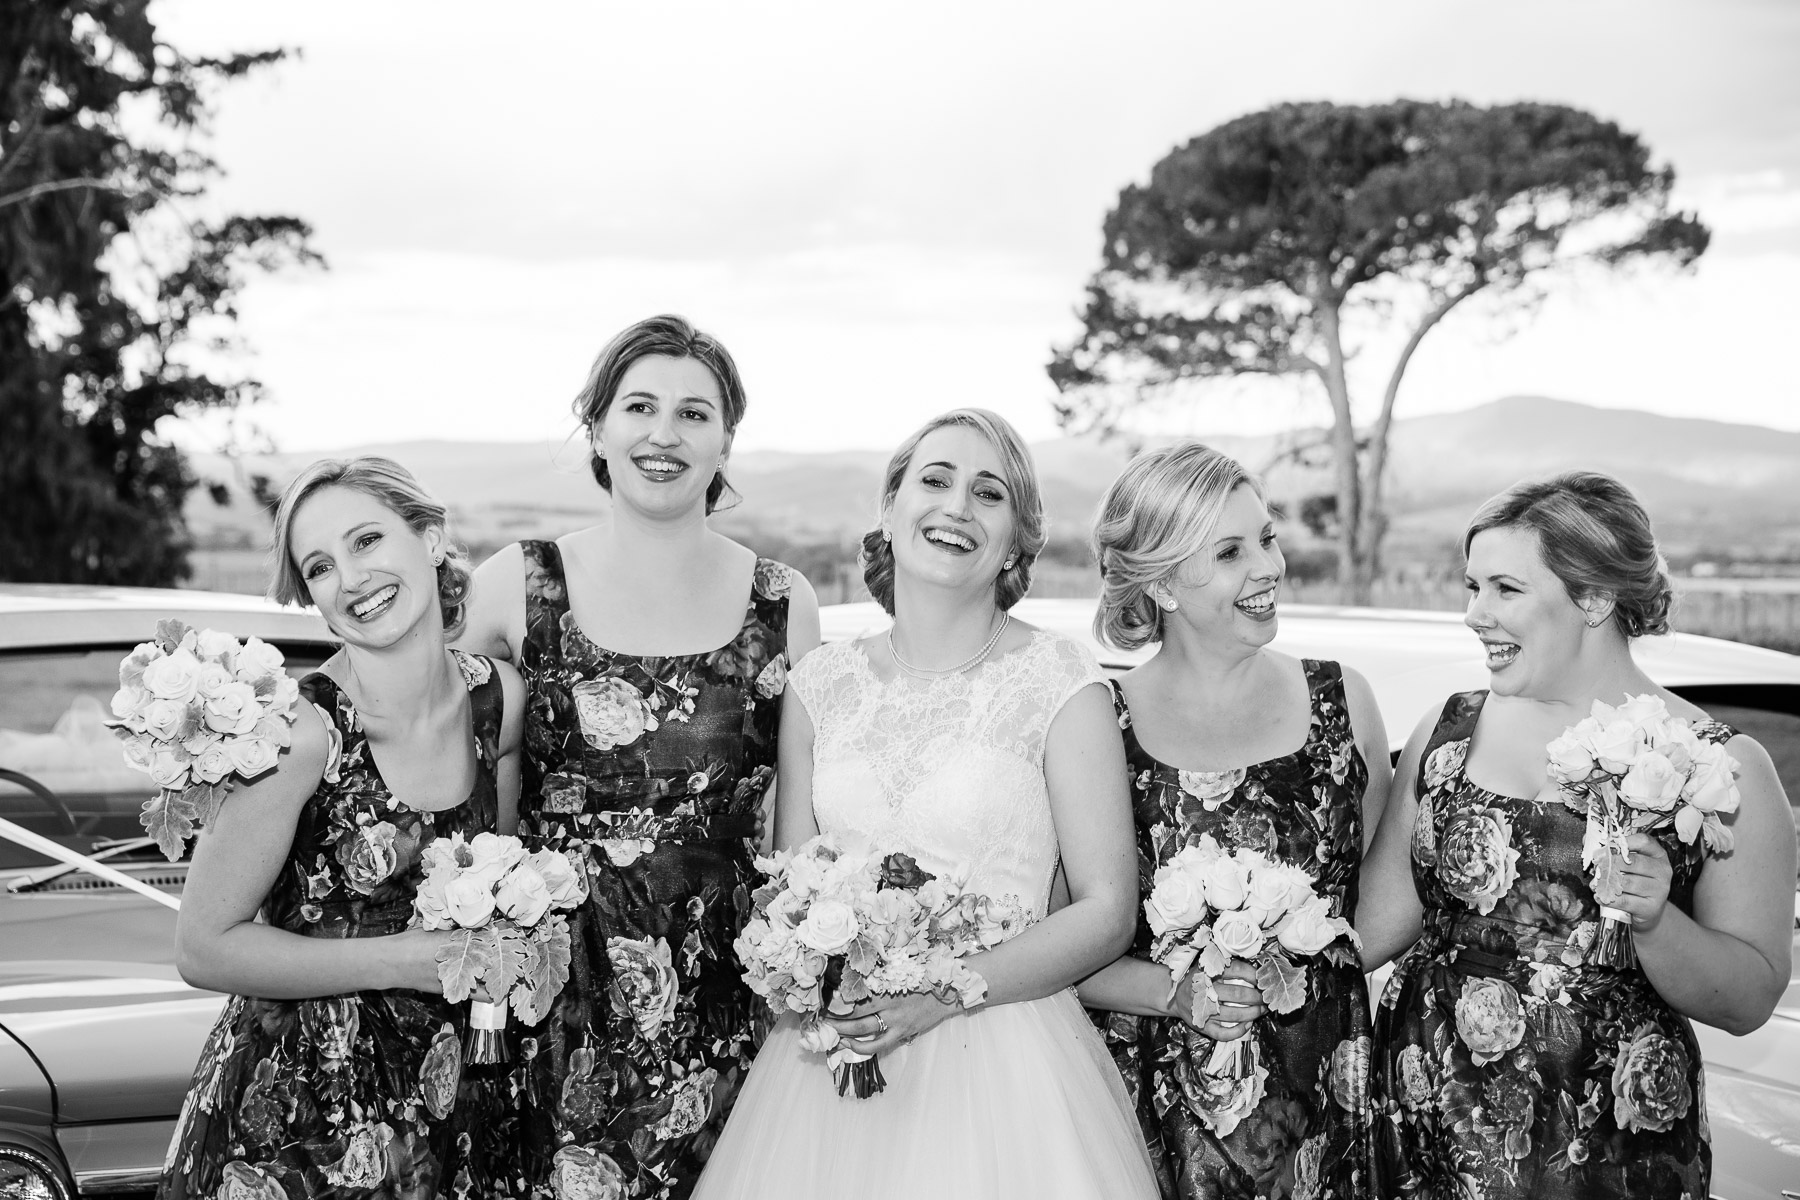 Marnie_and_Charlie_Yarra_Valley_Wedding_Blog-67.jpg